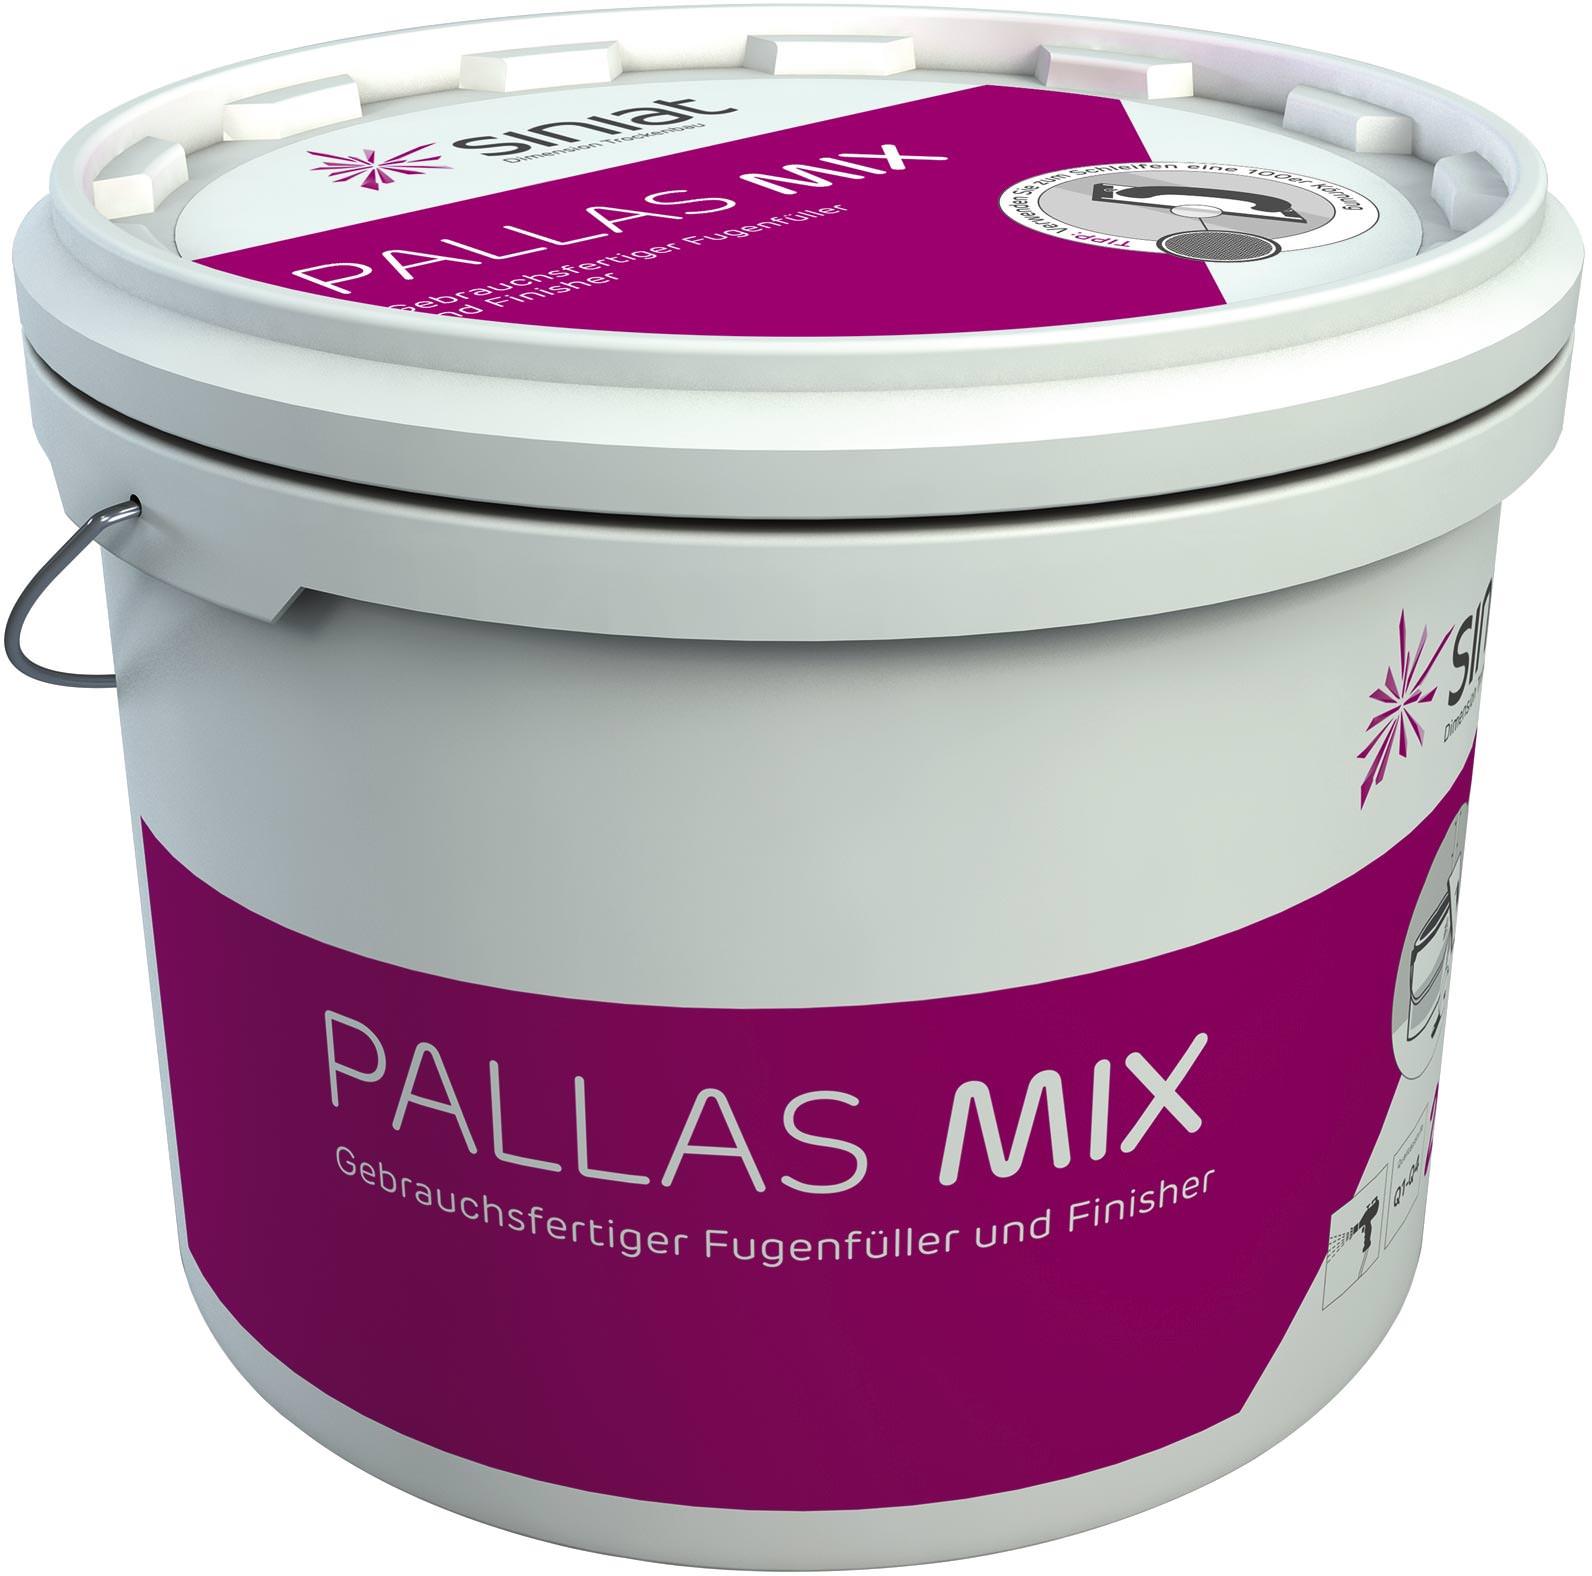 pallas mix: siniats universeller fertigspachtel jetzt im